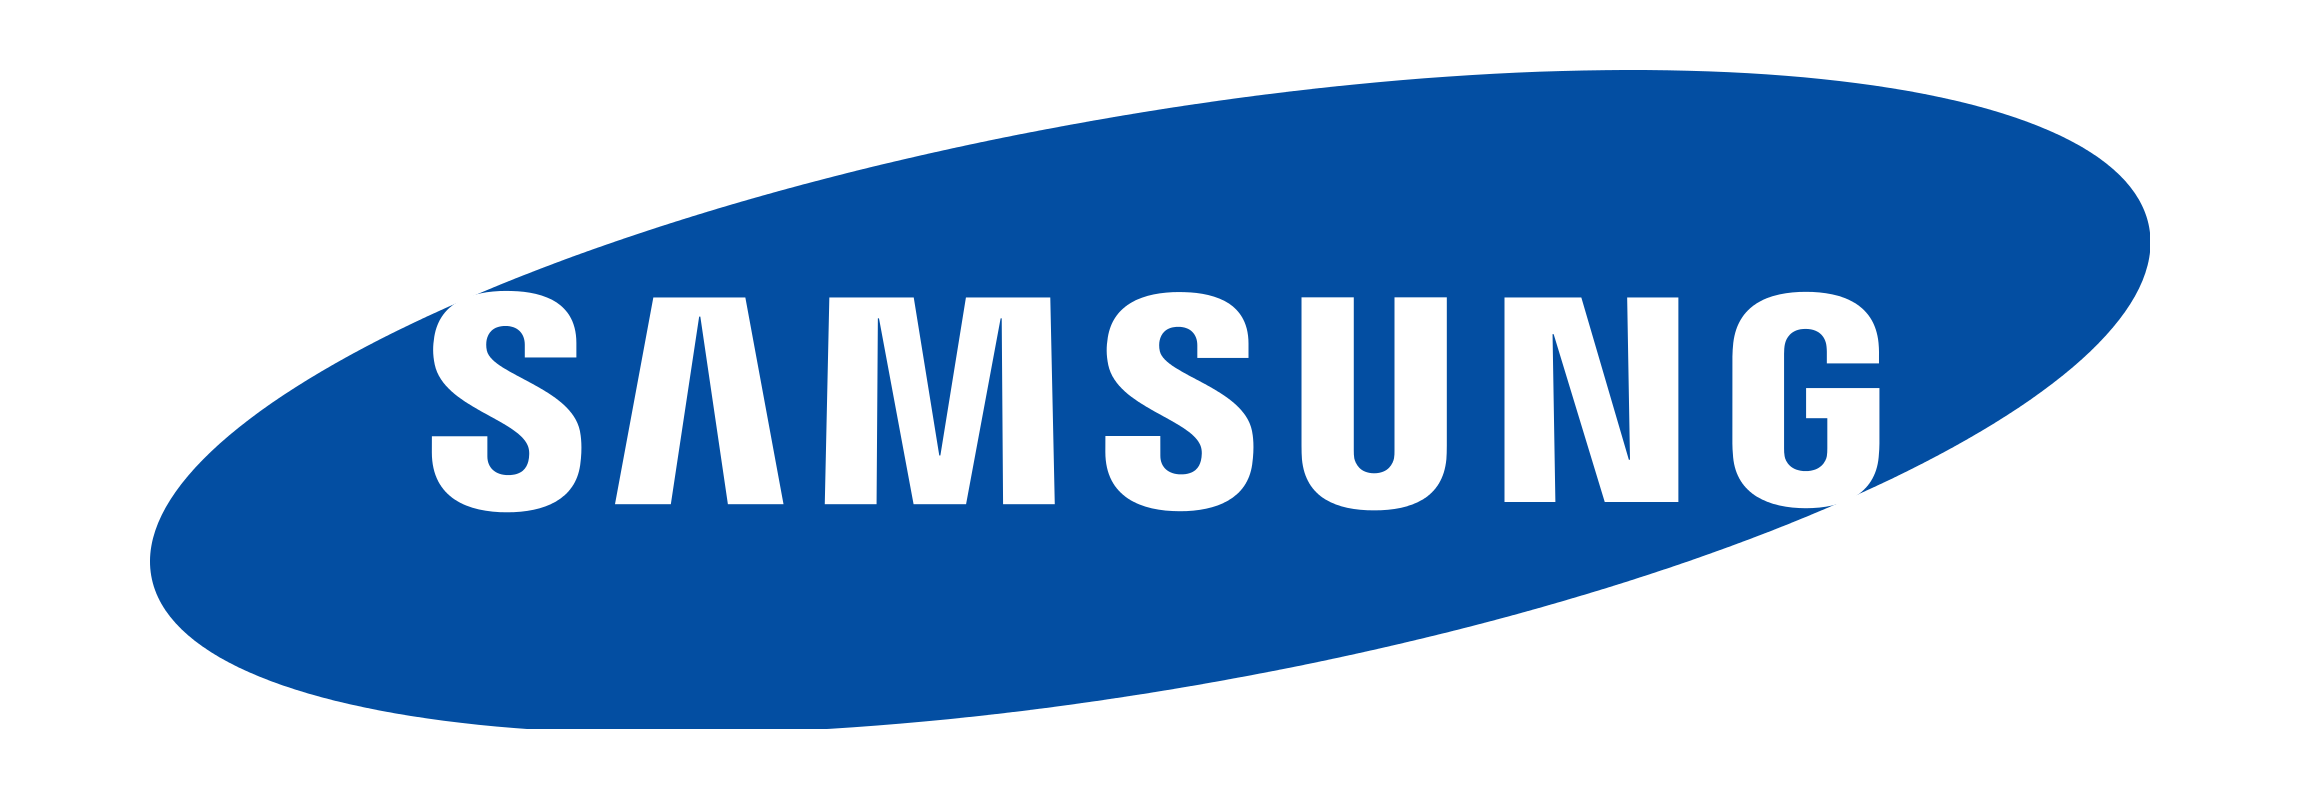 YMMV: Extra 10% Off Pre-order Galaxy S20 Phones